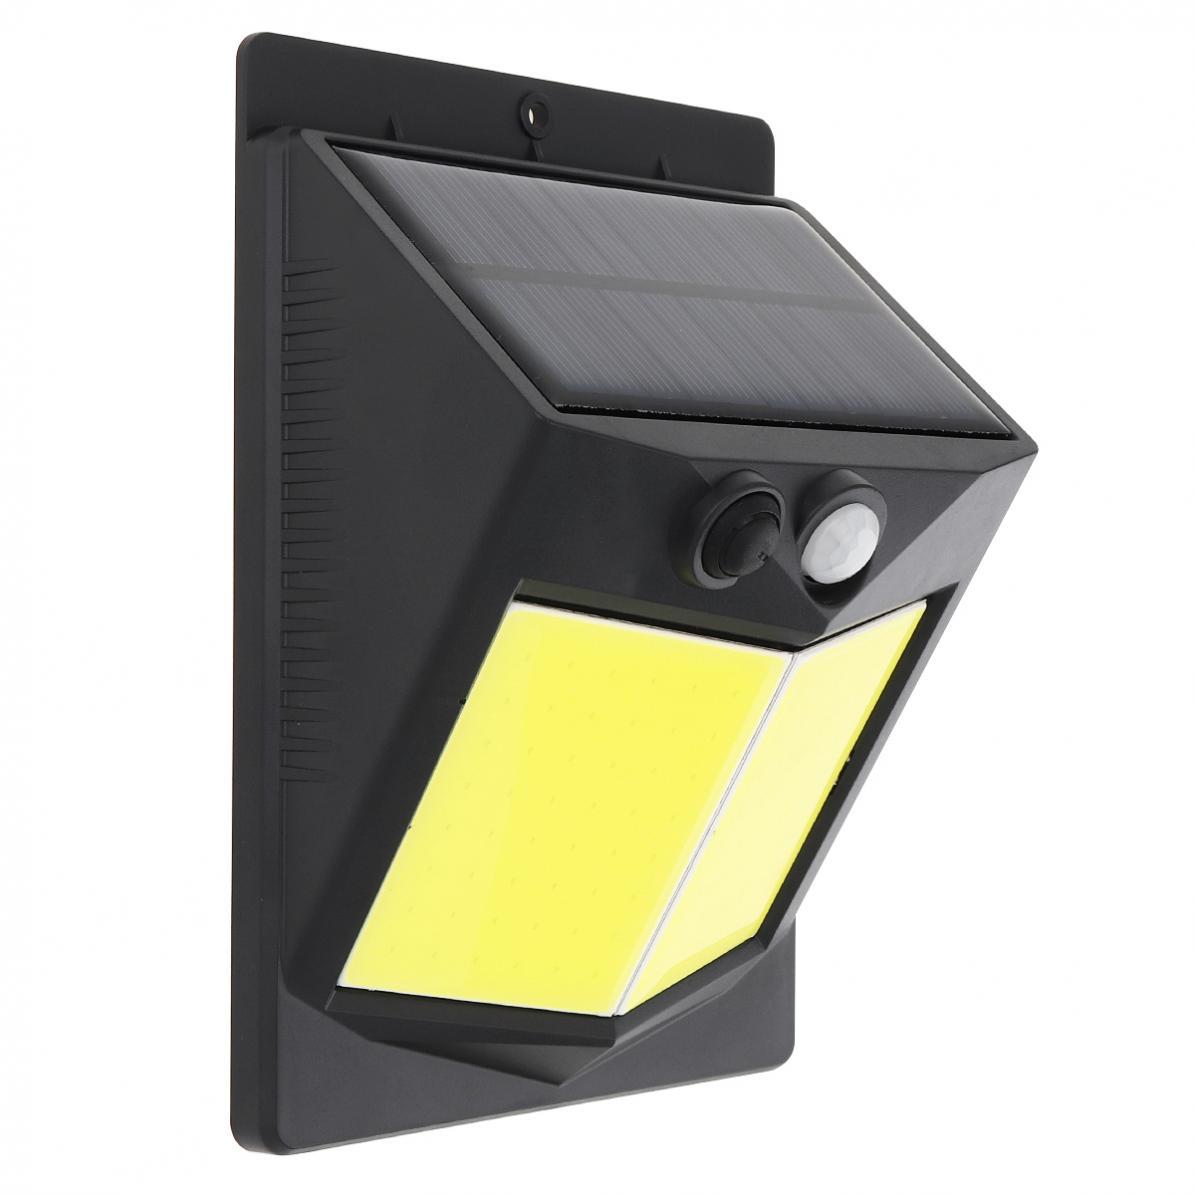 luz solar do sensor de movimento para patio exterior iluminando 05